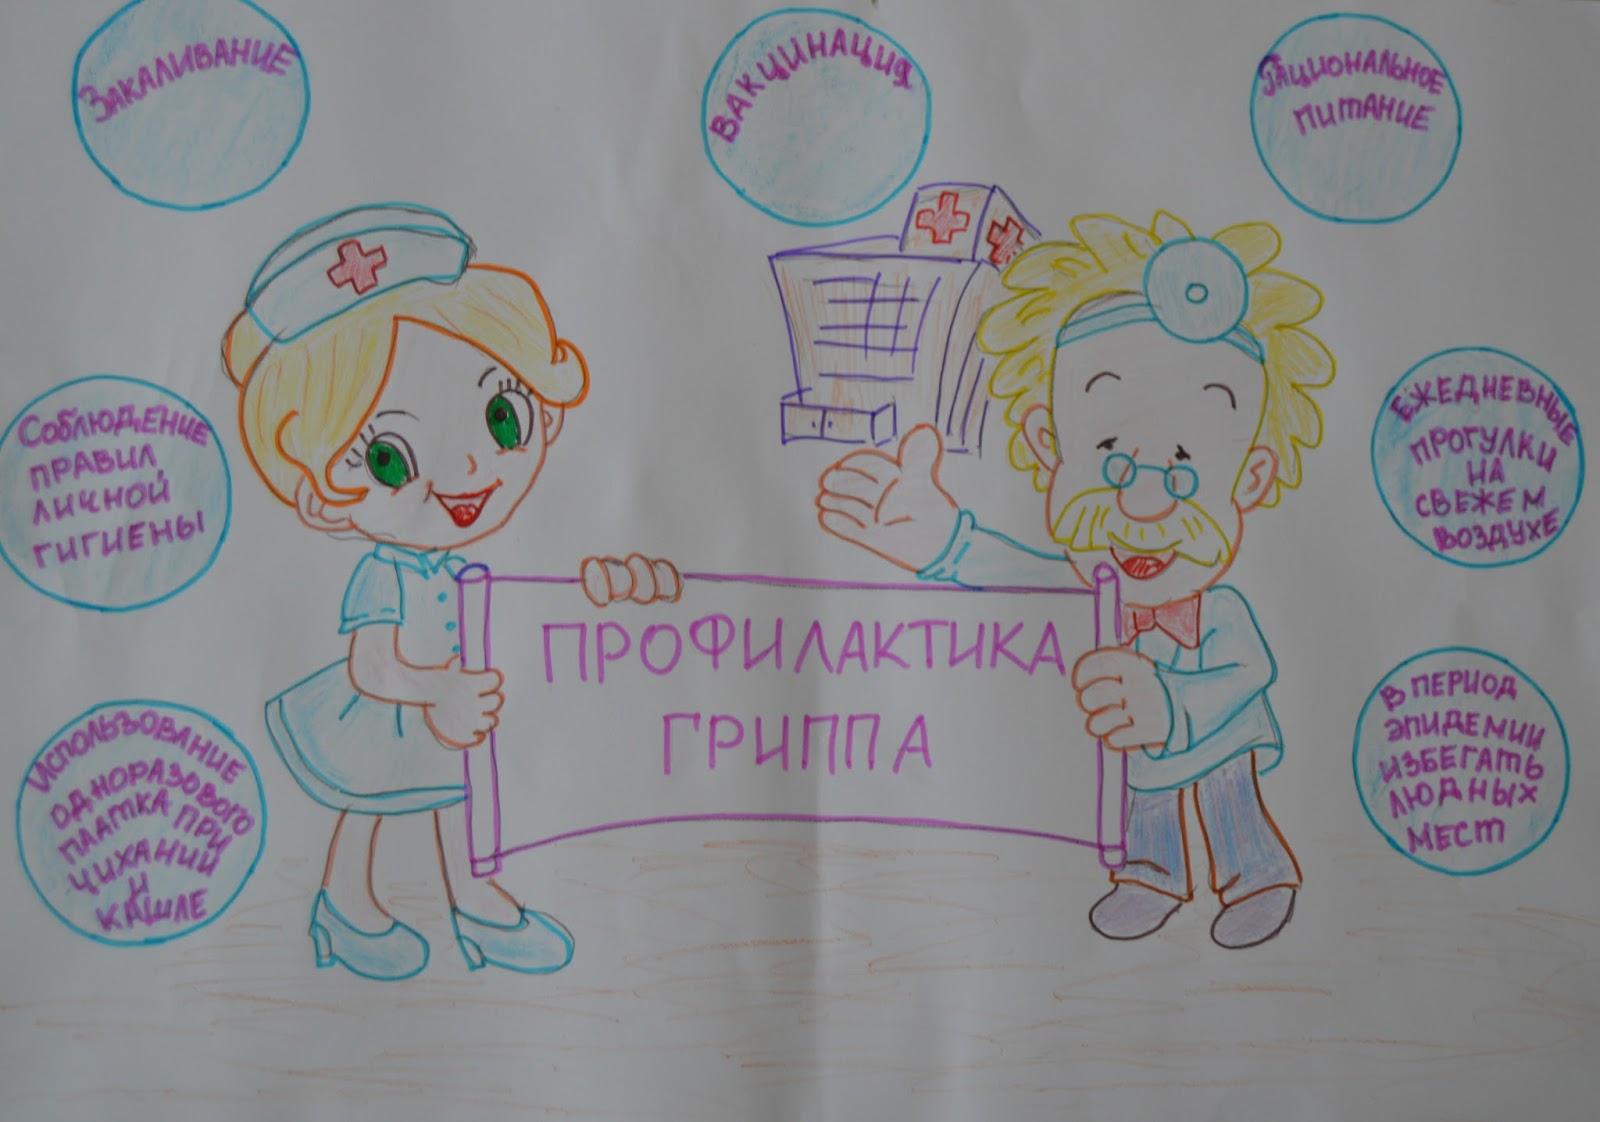 Профилактика гриппа детские рисунки плакаты